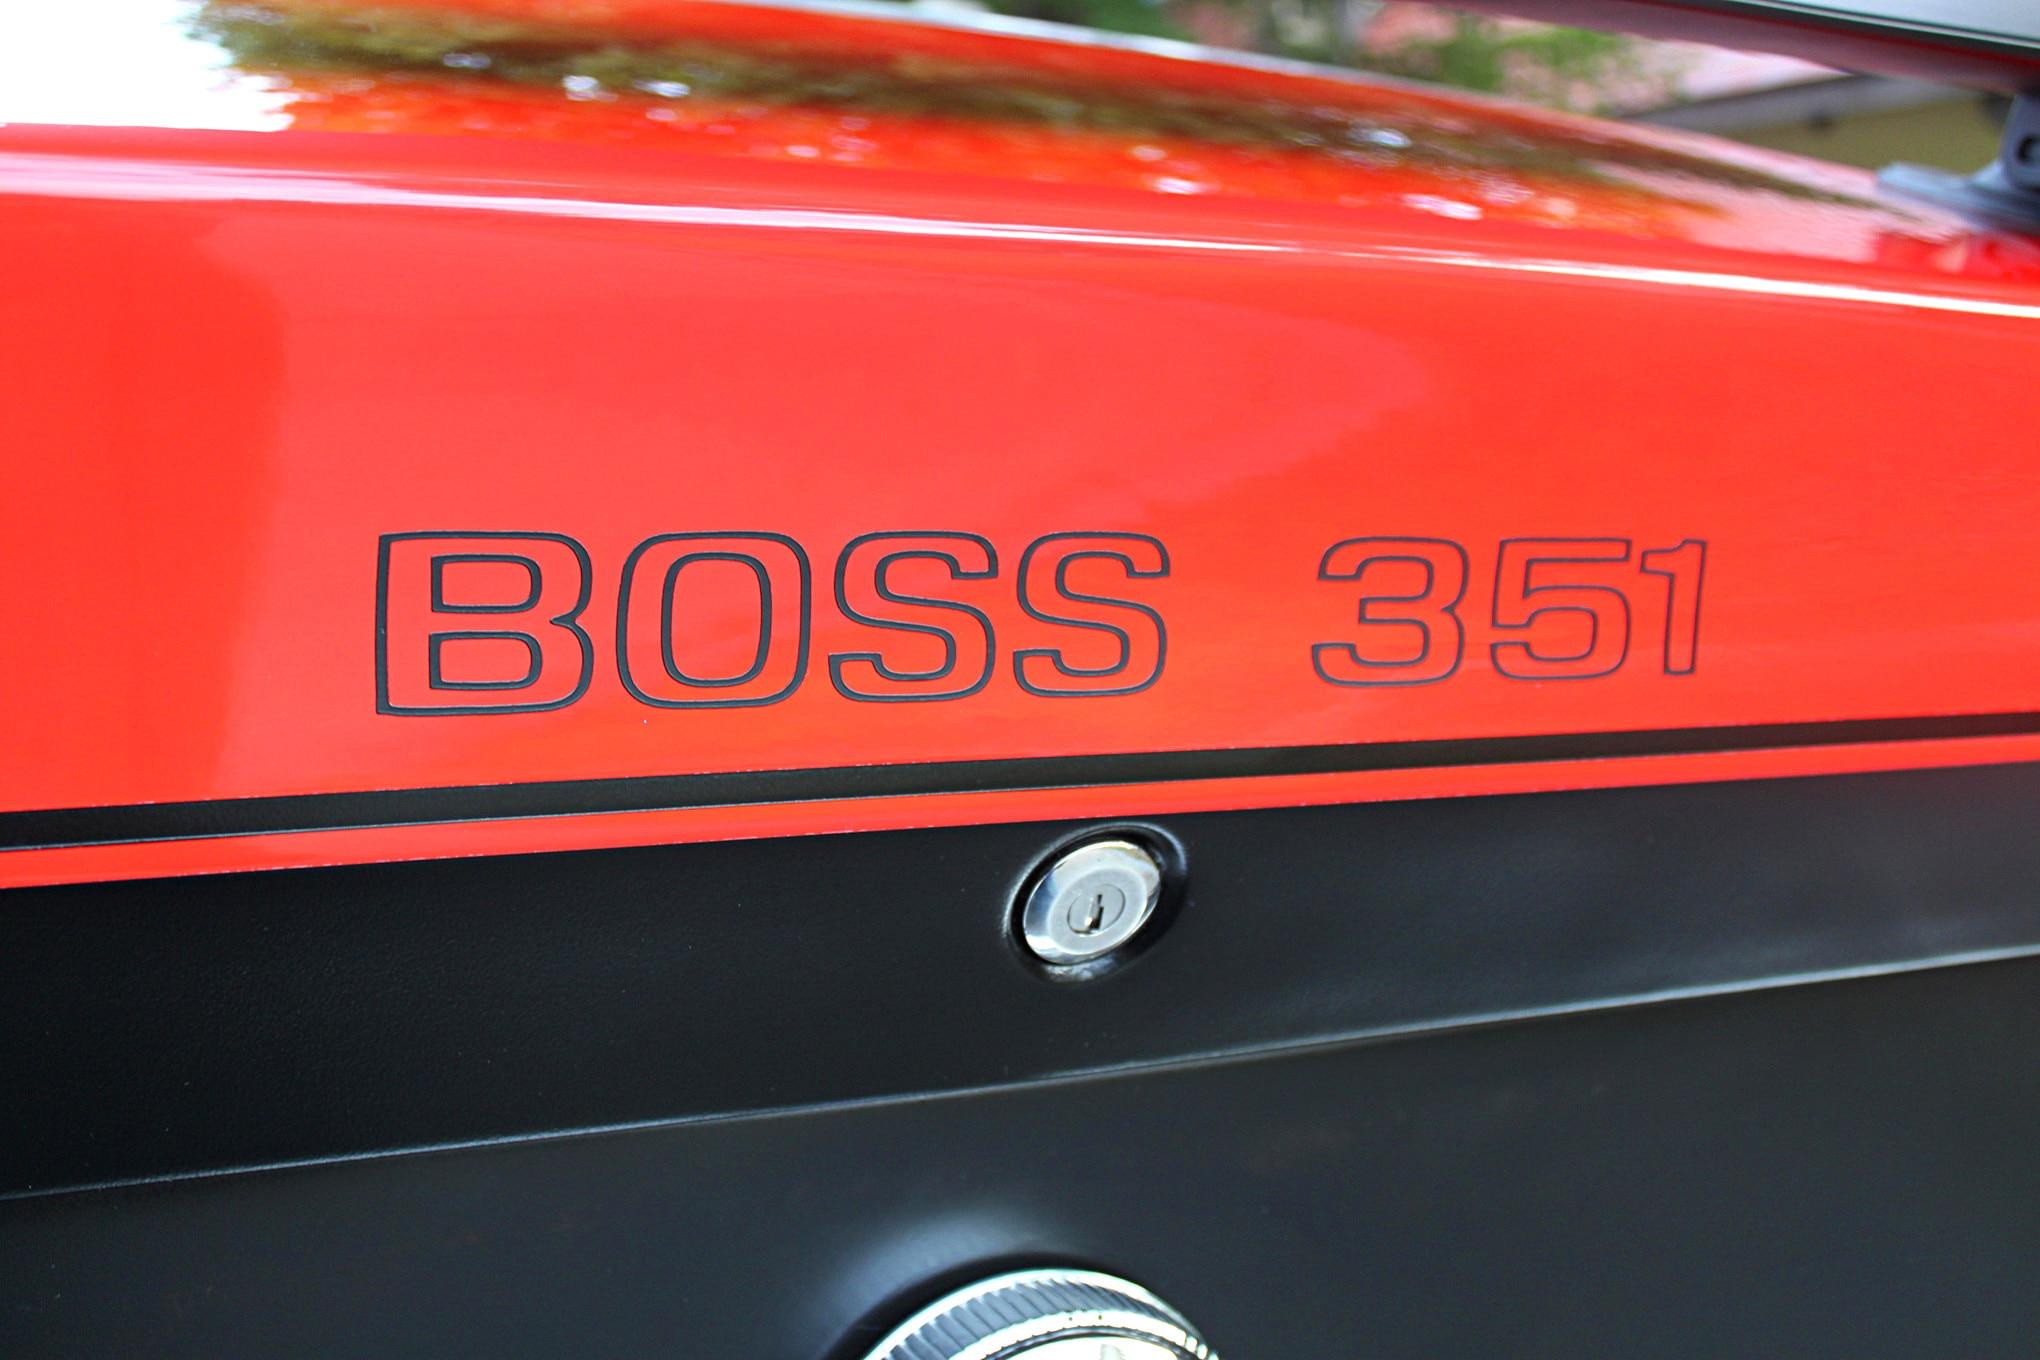 1971 Mustang Boss 351 06